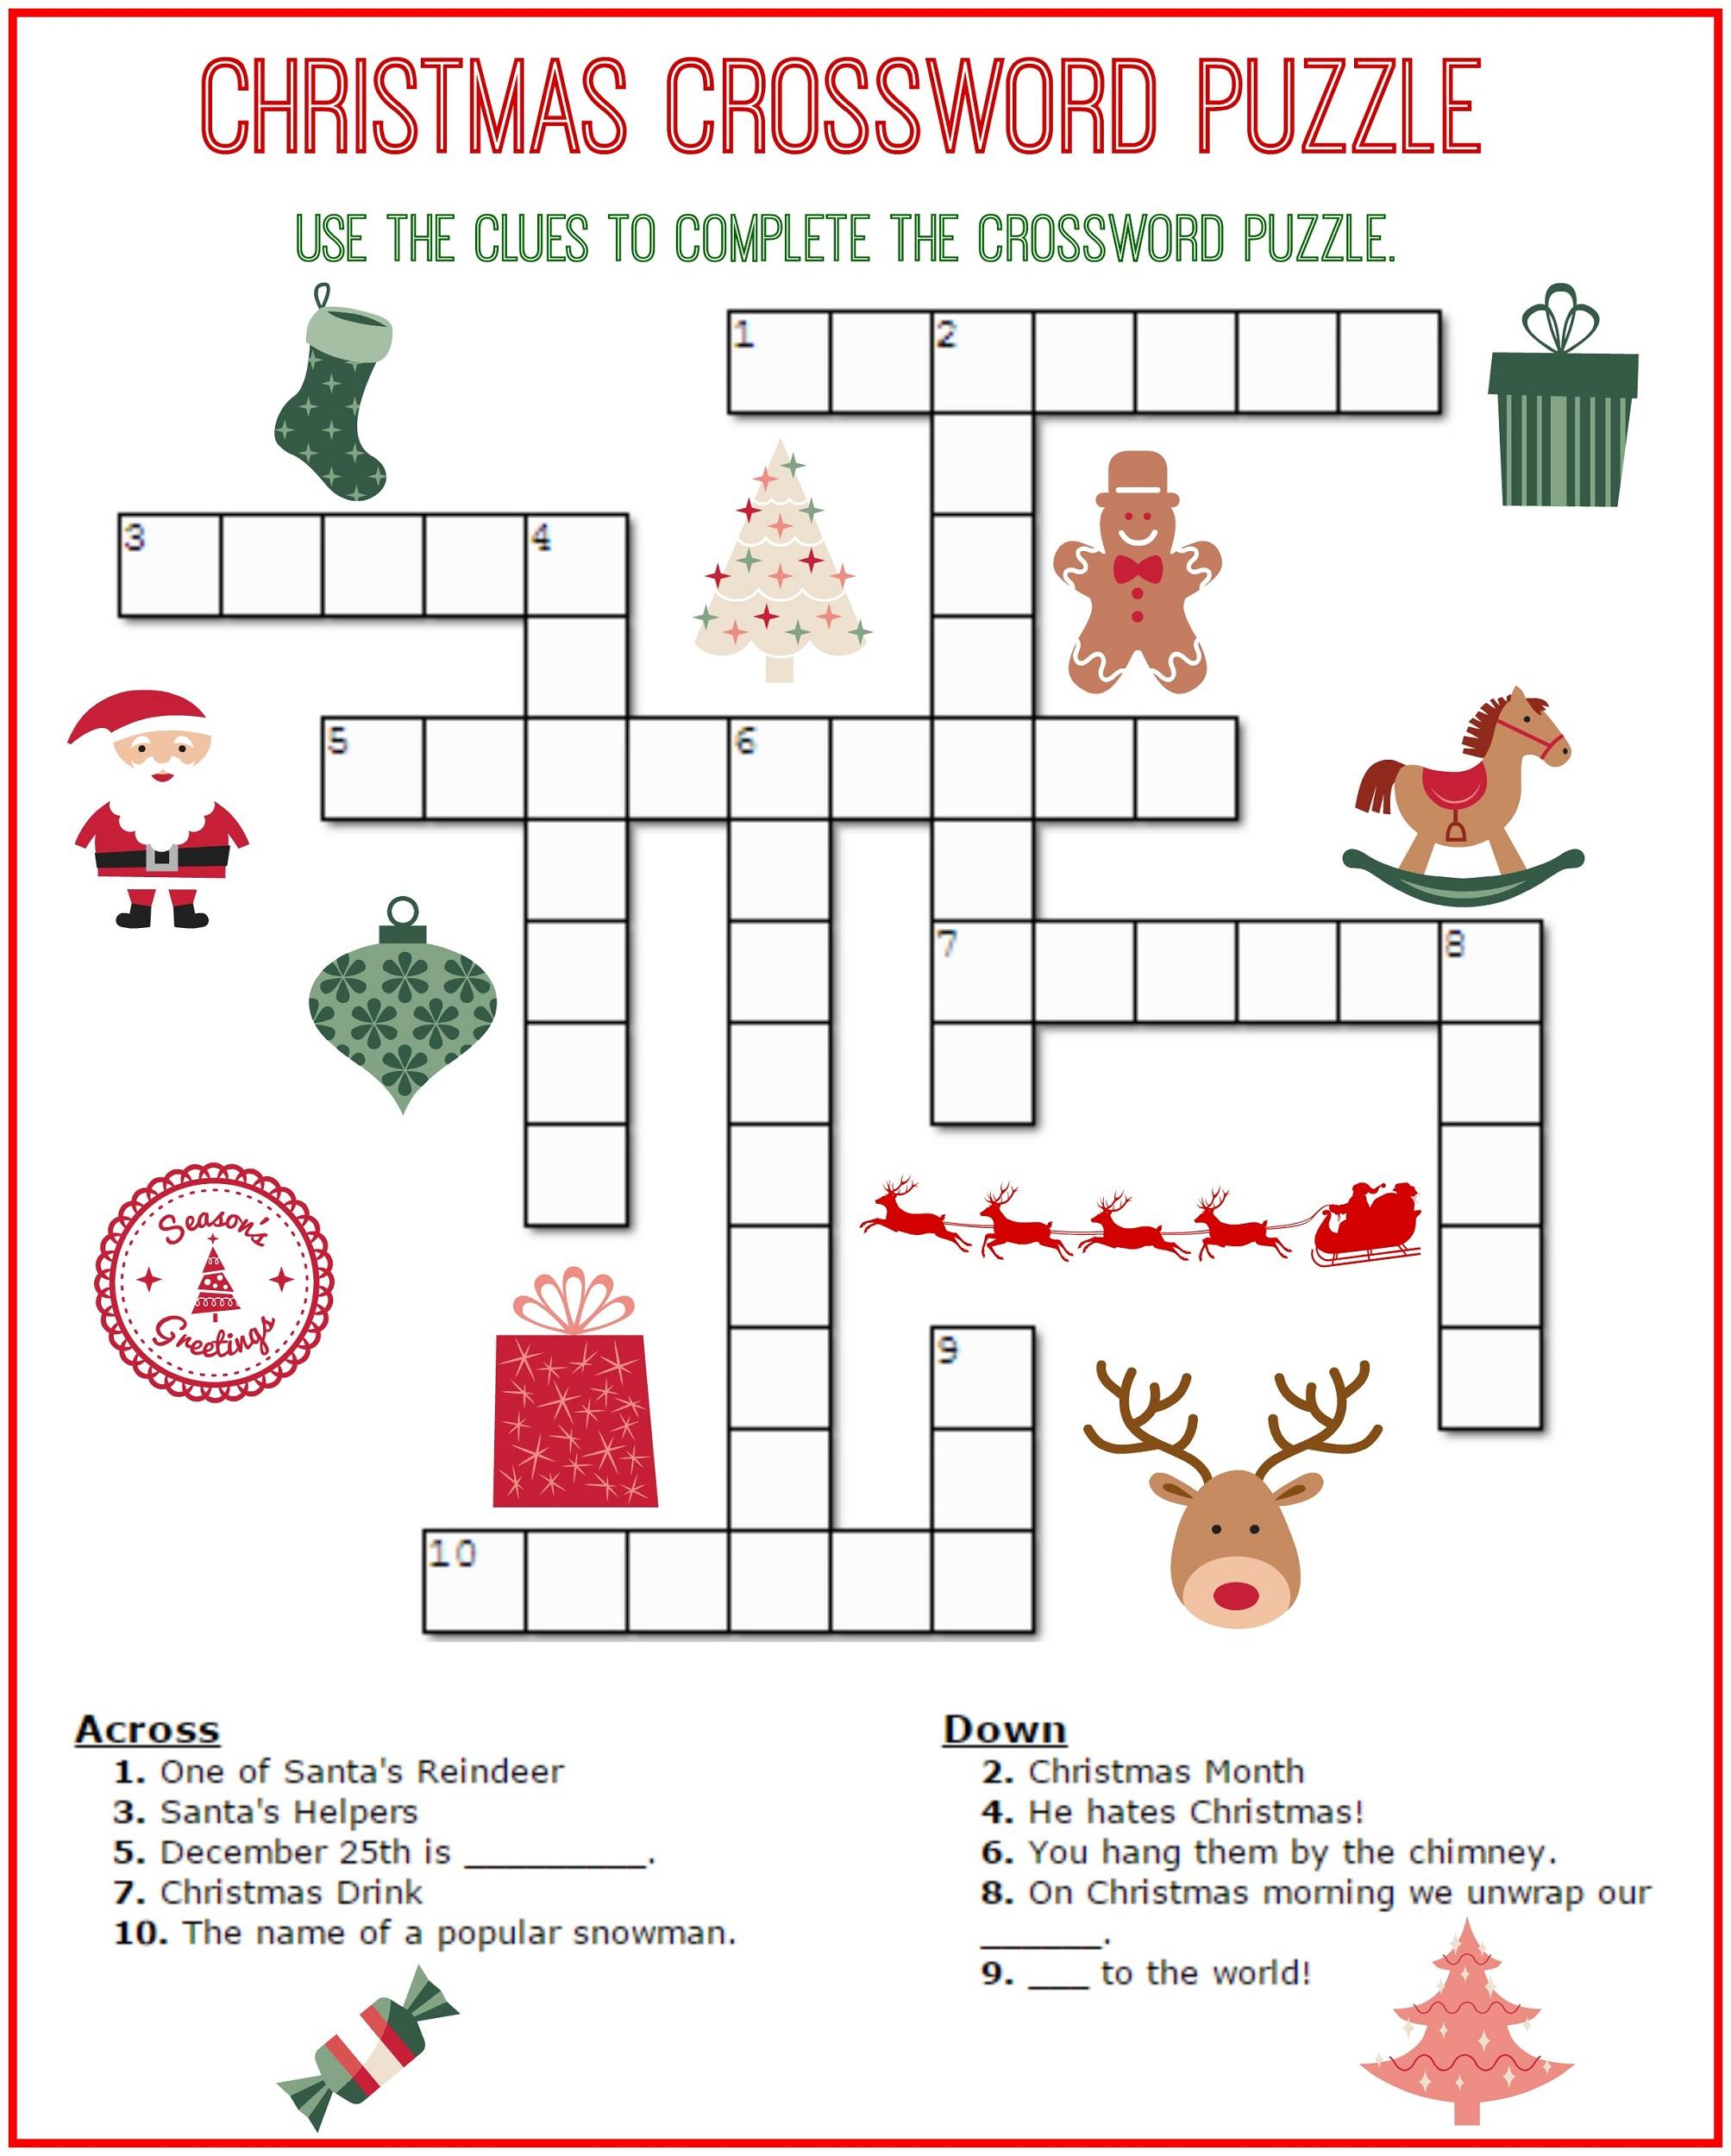 Crossword Puzzle Kids Printable 2017 | Kiddo Shelter - Free Easy - Printable Crossword Puzzles For 5 Year Olds